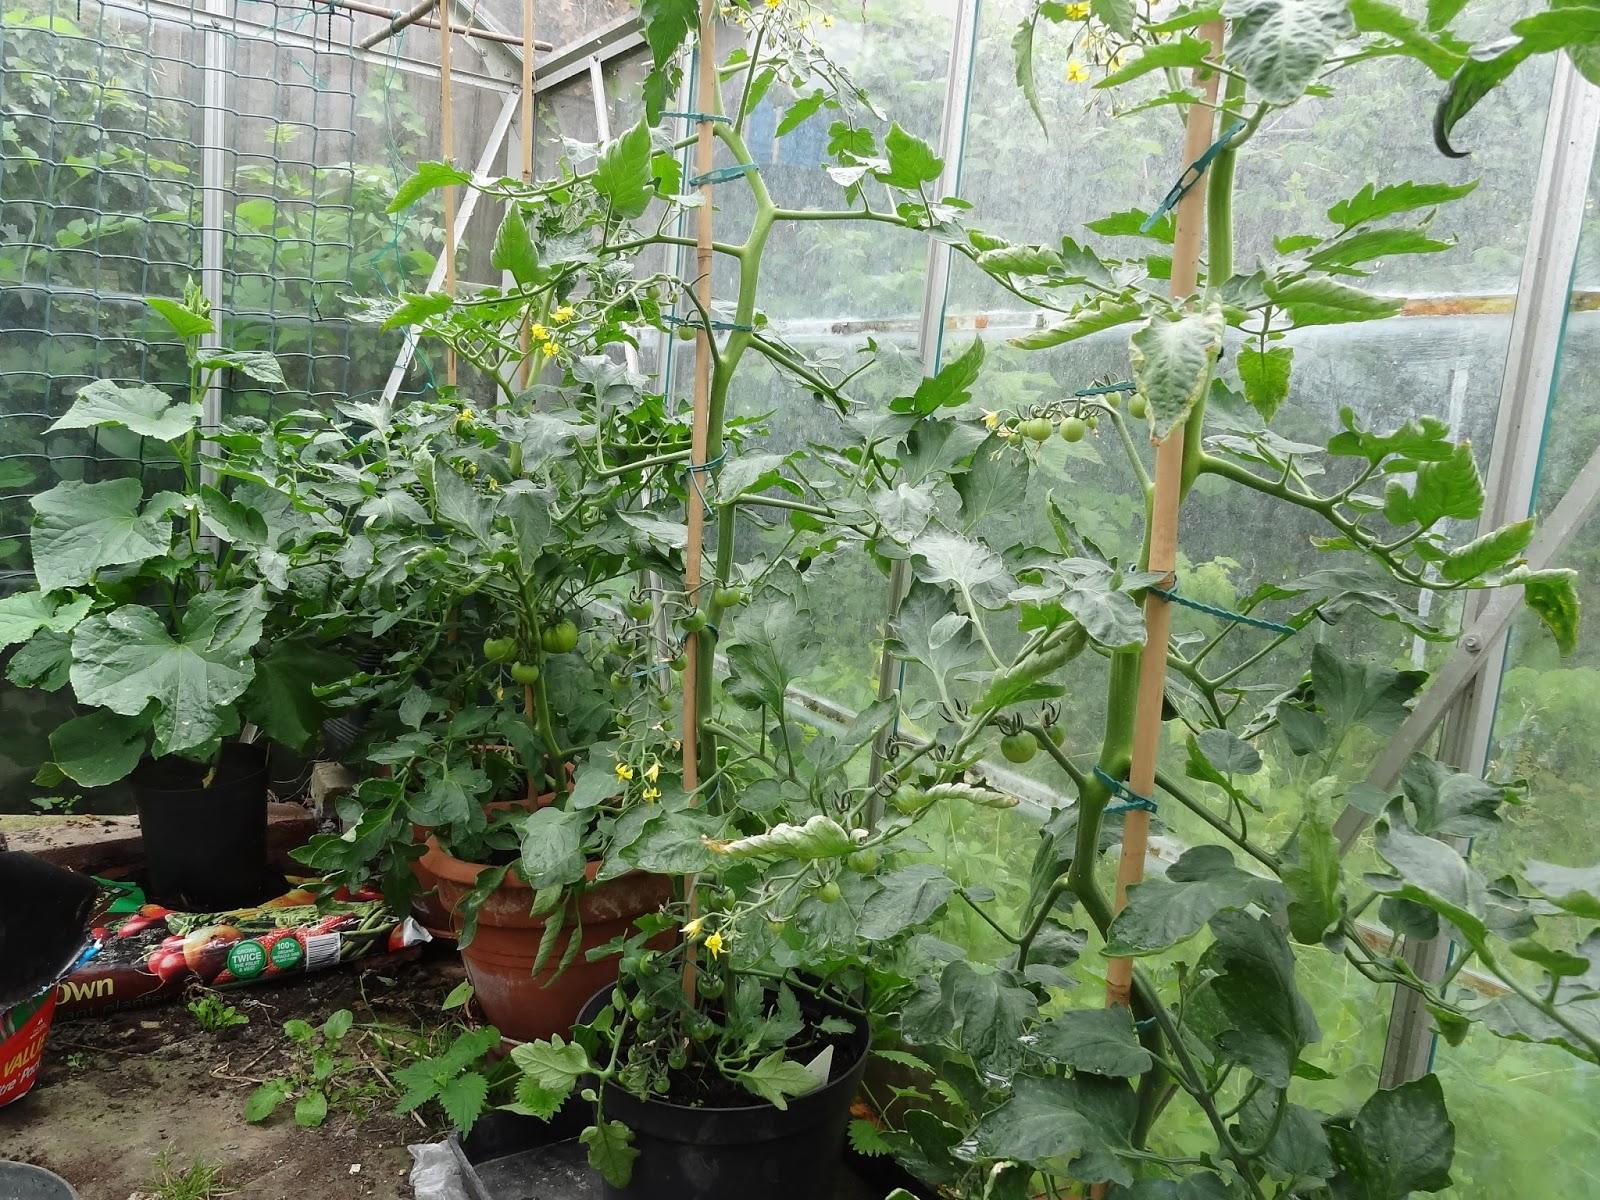 Gardeners Voice » Blog Archive » Summer Solstice Allotment